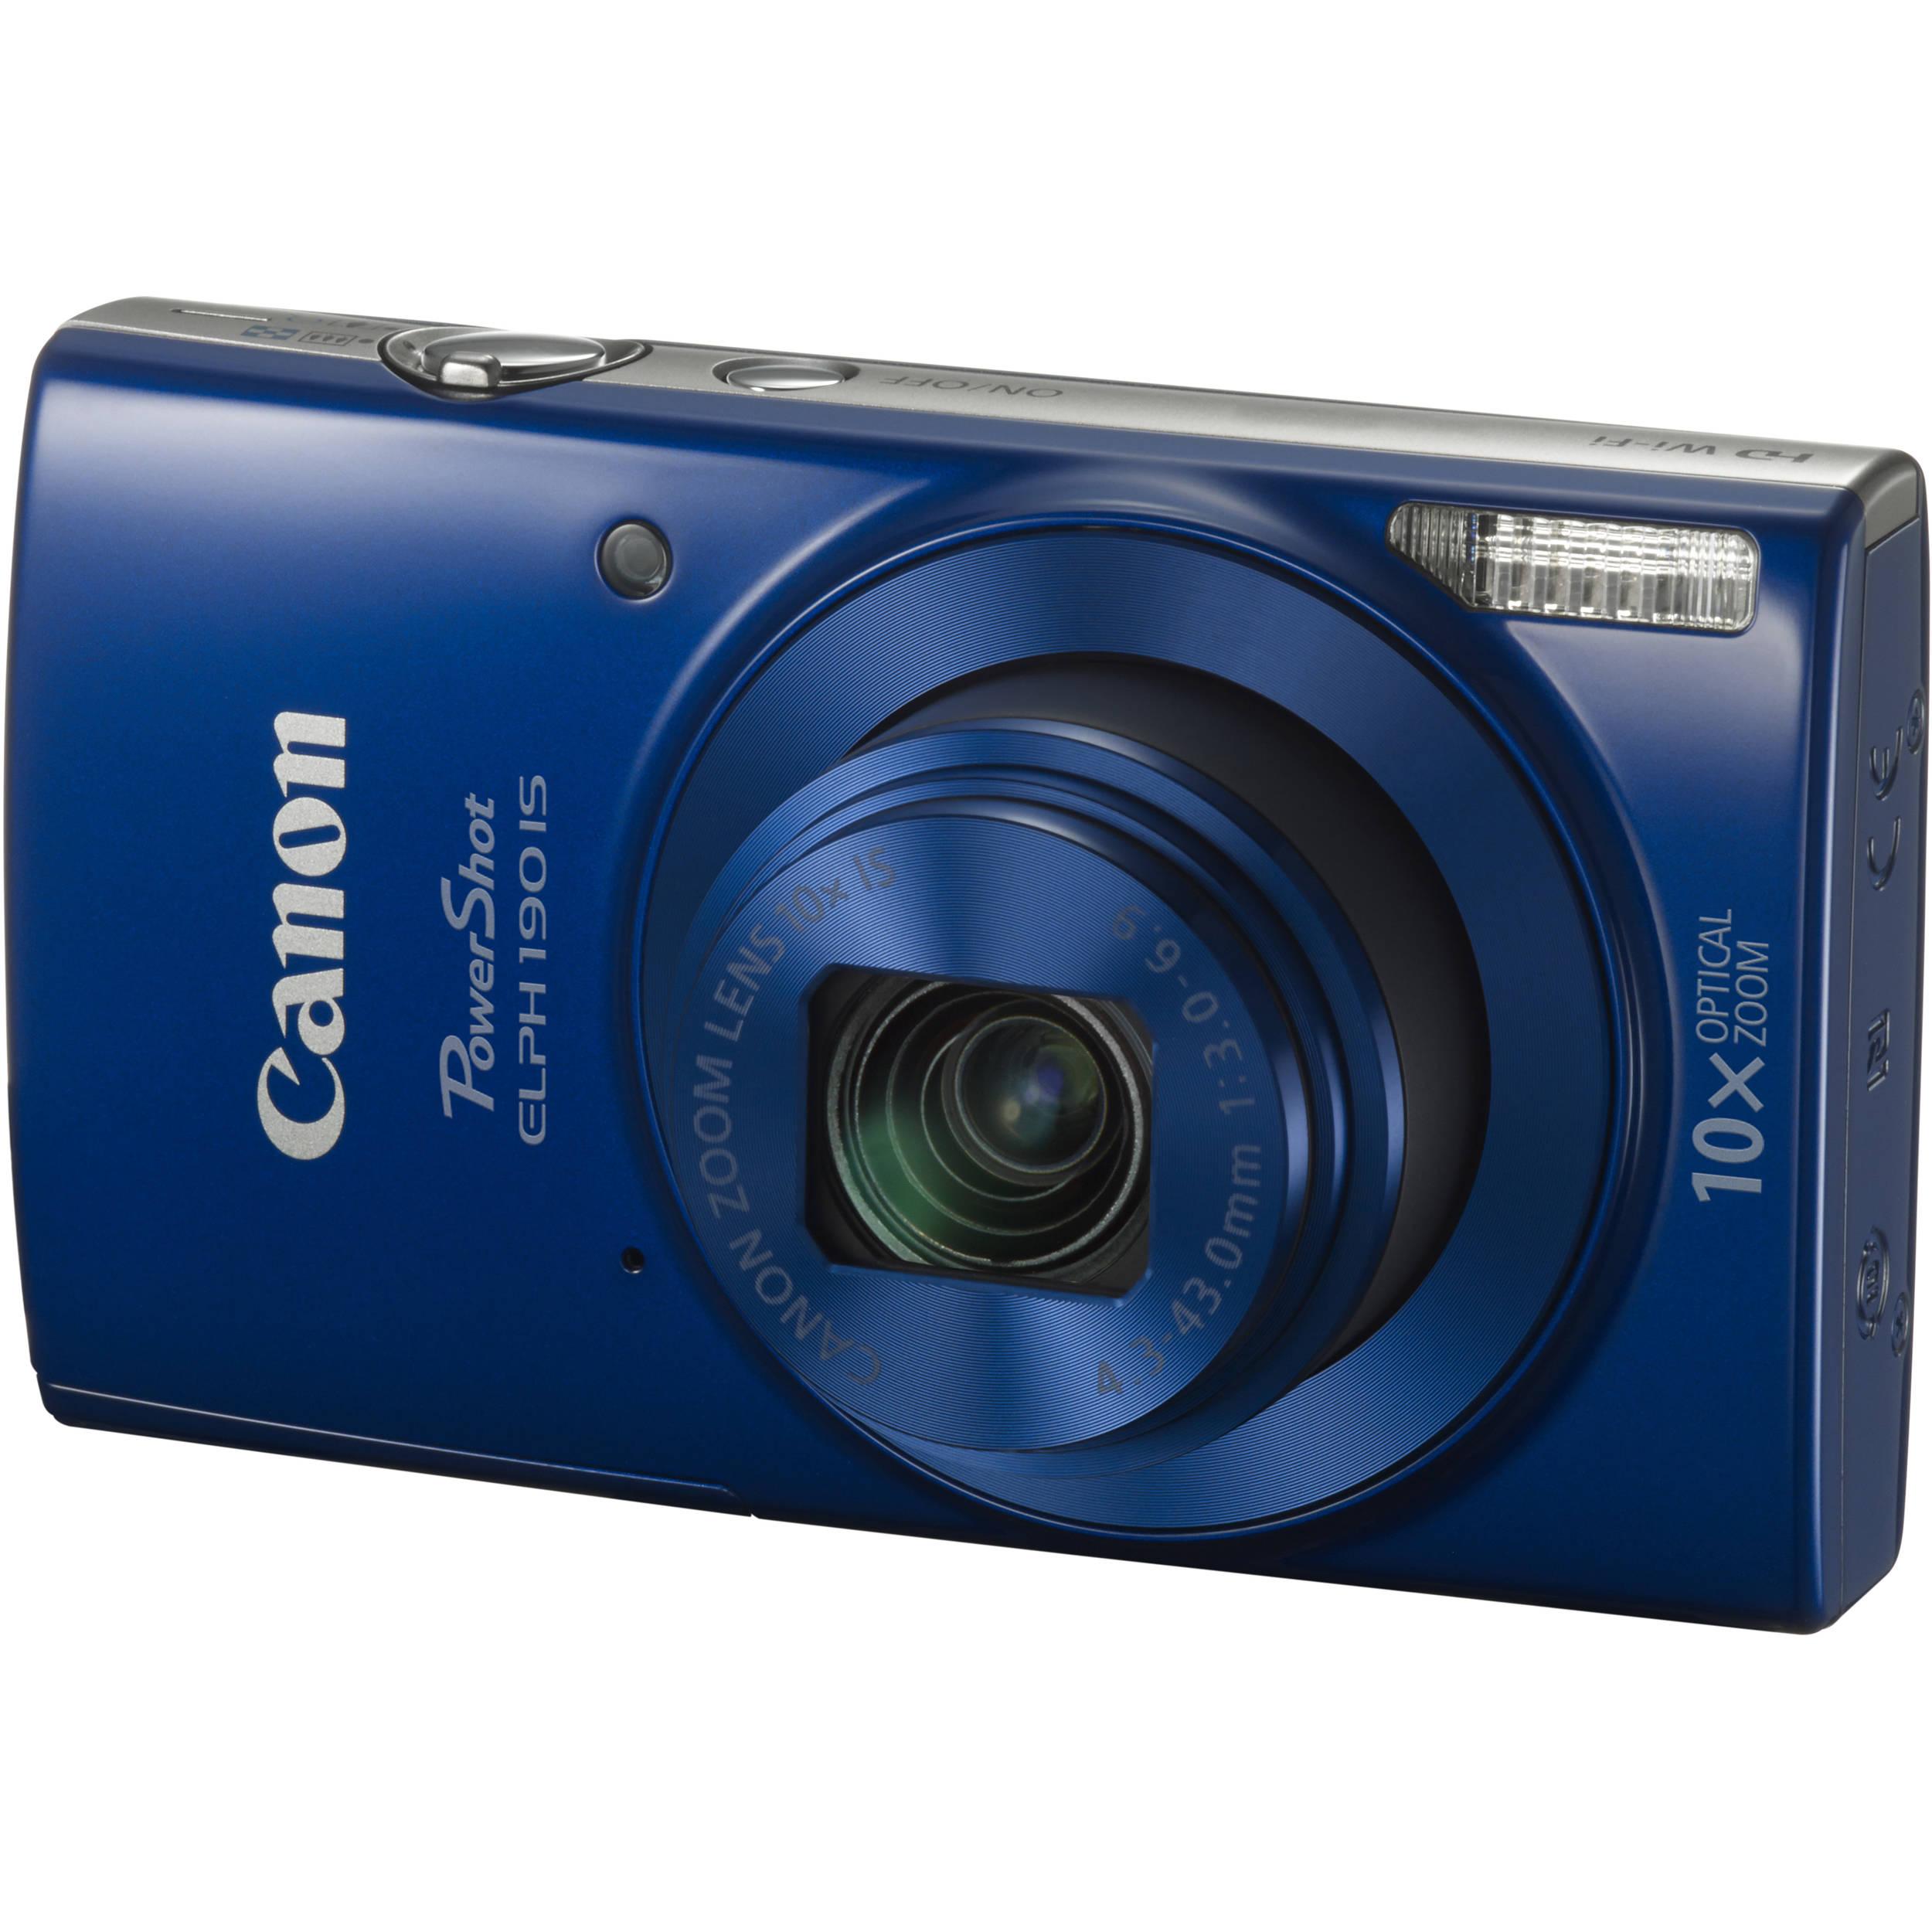 Memory Card SDHC Canon PowerShot ELPH 190 is Digital Camera Memory Card 2X 16GB Standard Secure Digital 1 Twin Pack